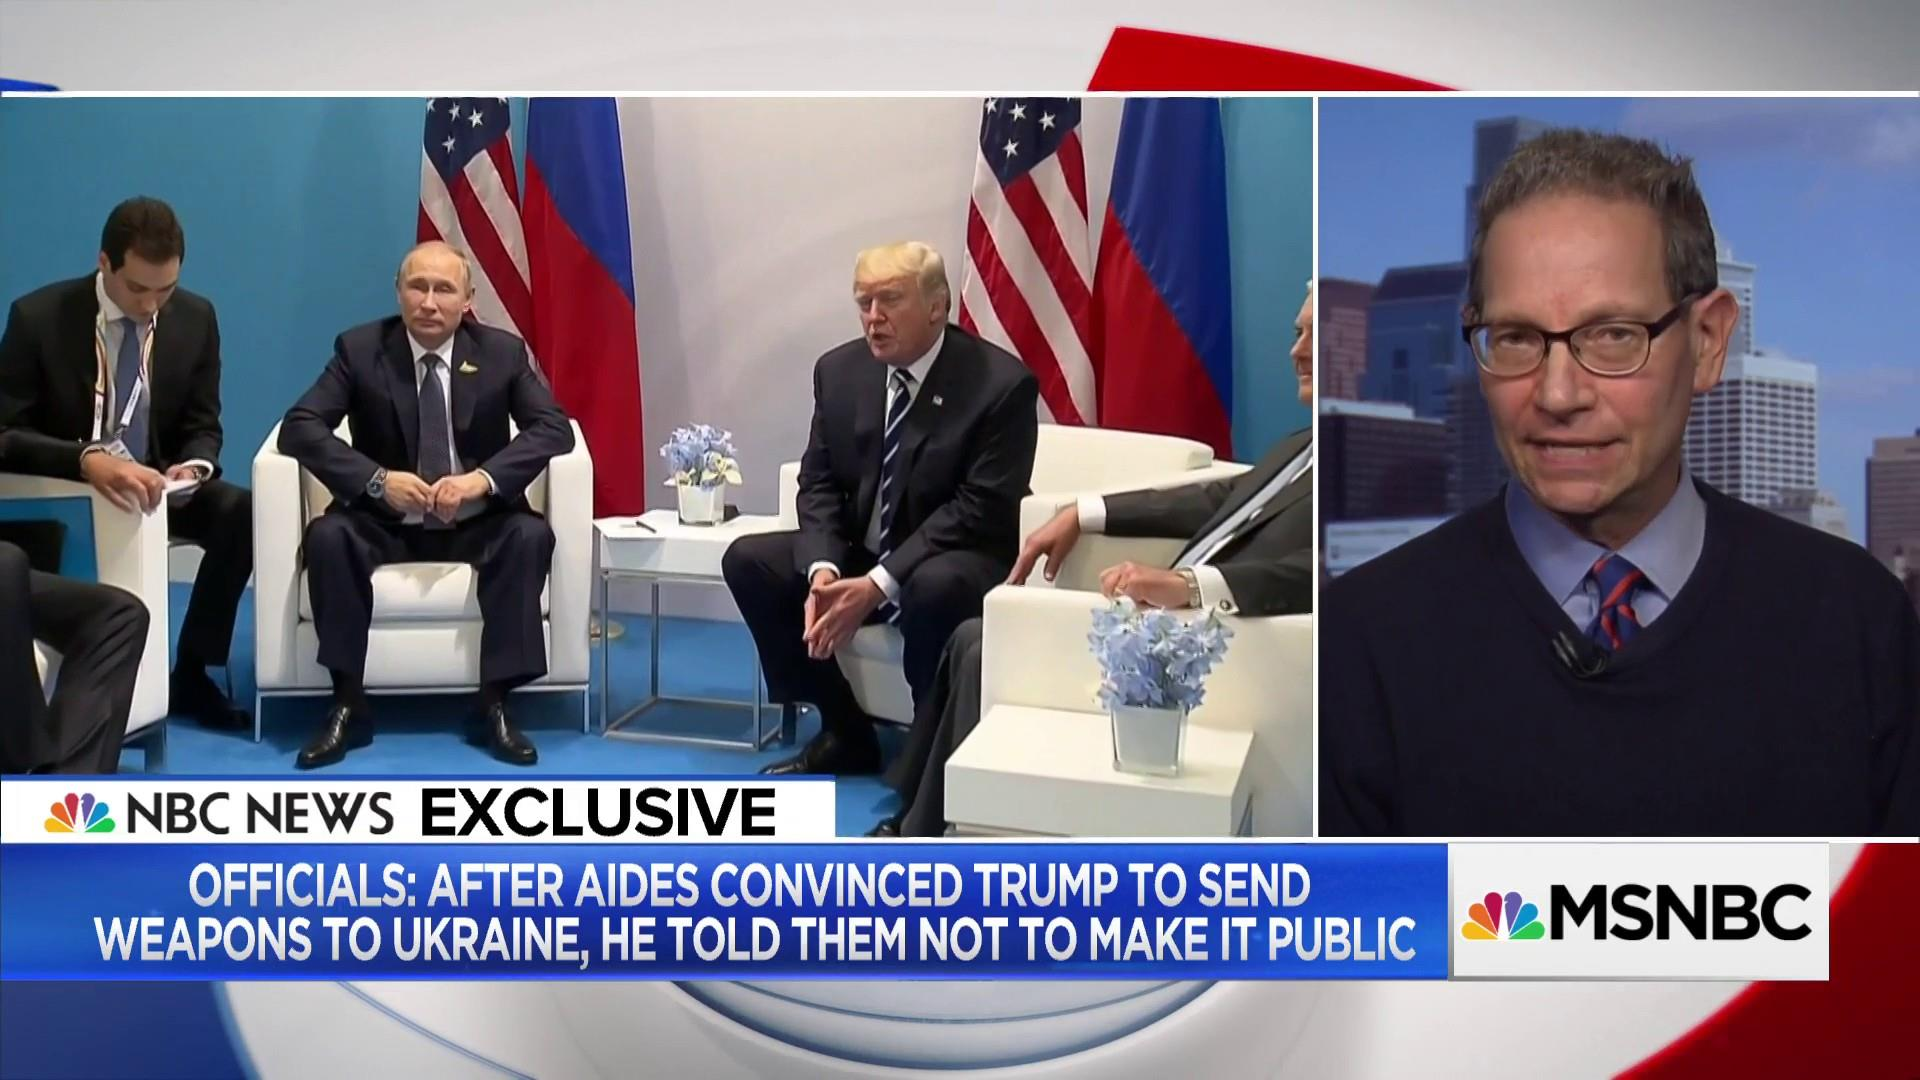 U.S. Russia tensions flare